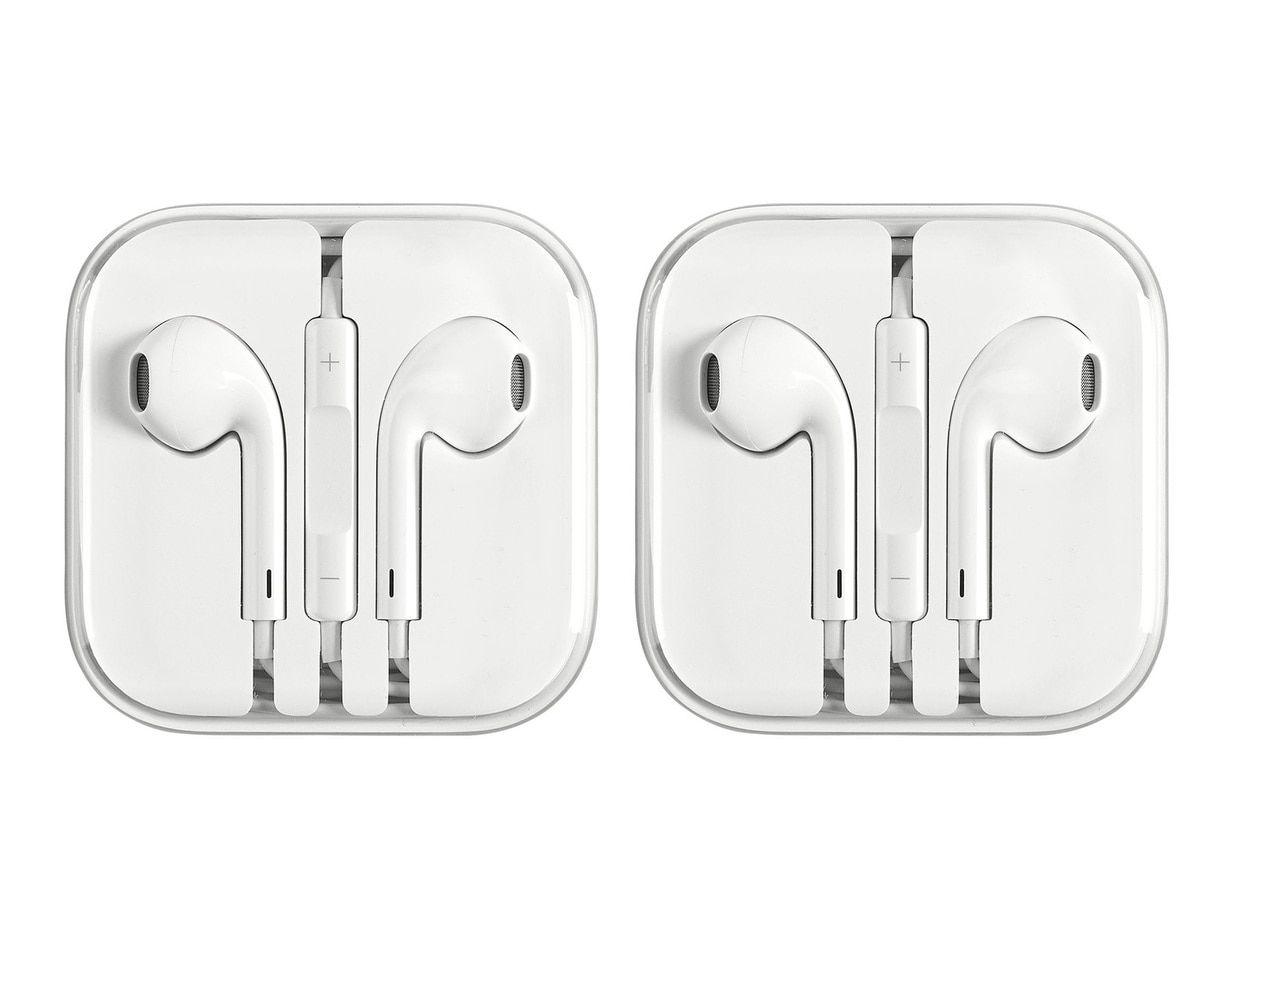 Apple Earpods 3 5 Mm With Remote And Microphone 2 Pack In Bulk Packaging Refurbished Apple Earphones Apple Headphone Apple Iphone 5